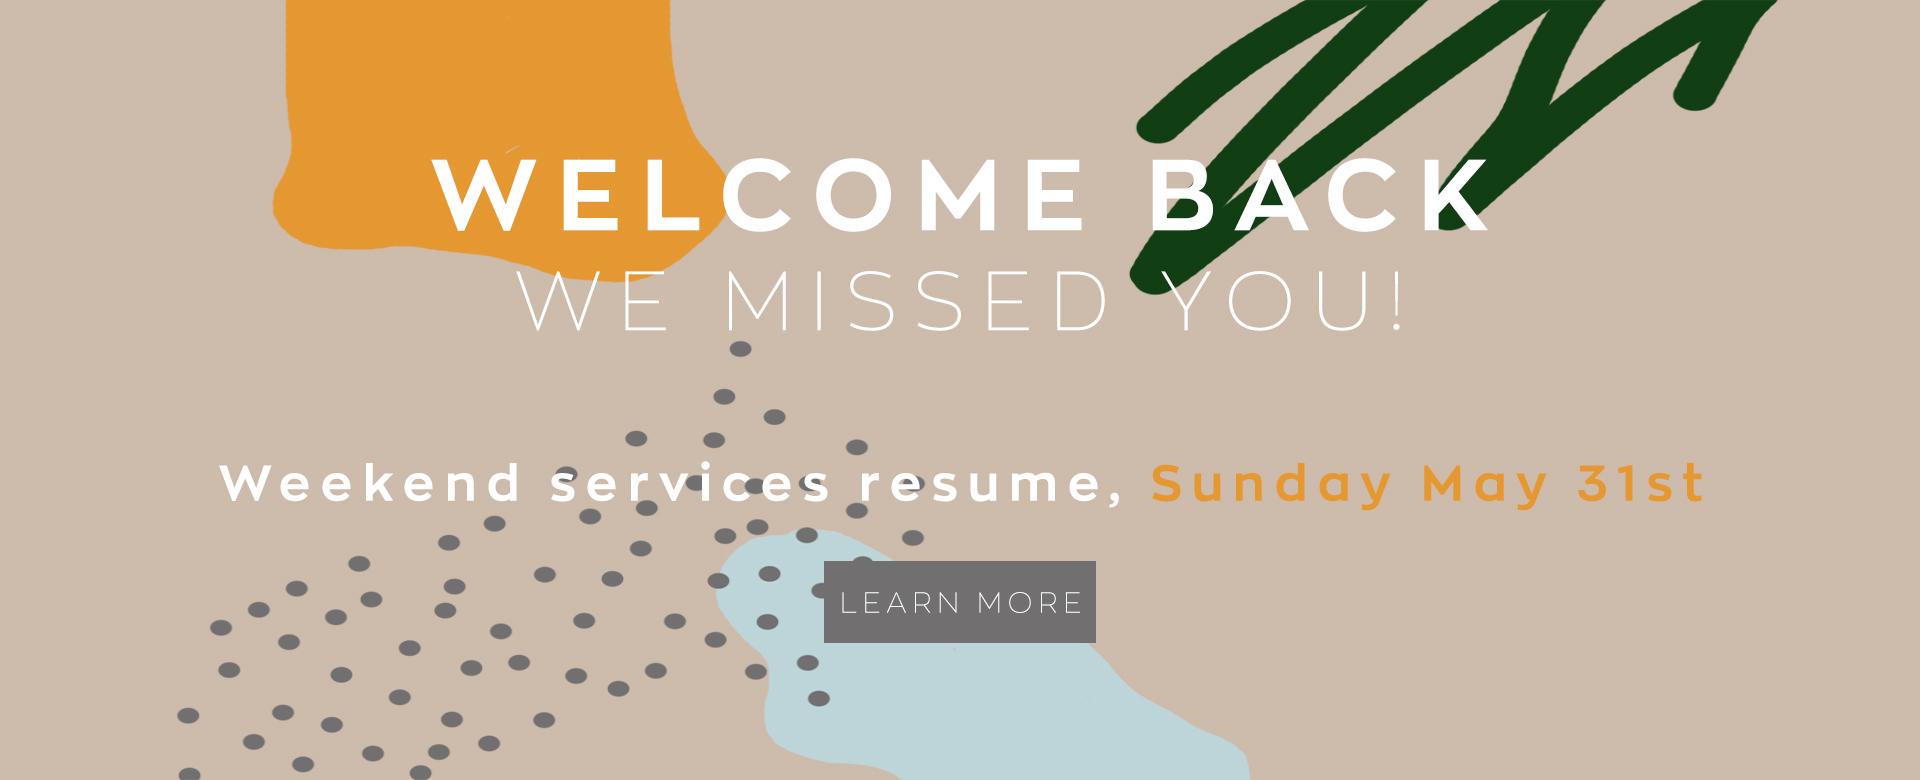 Welcome Back Homepage